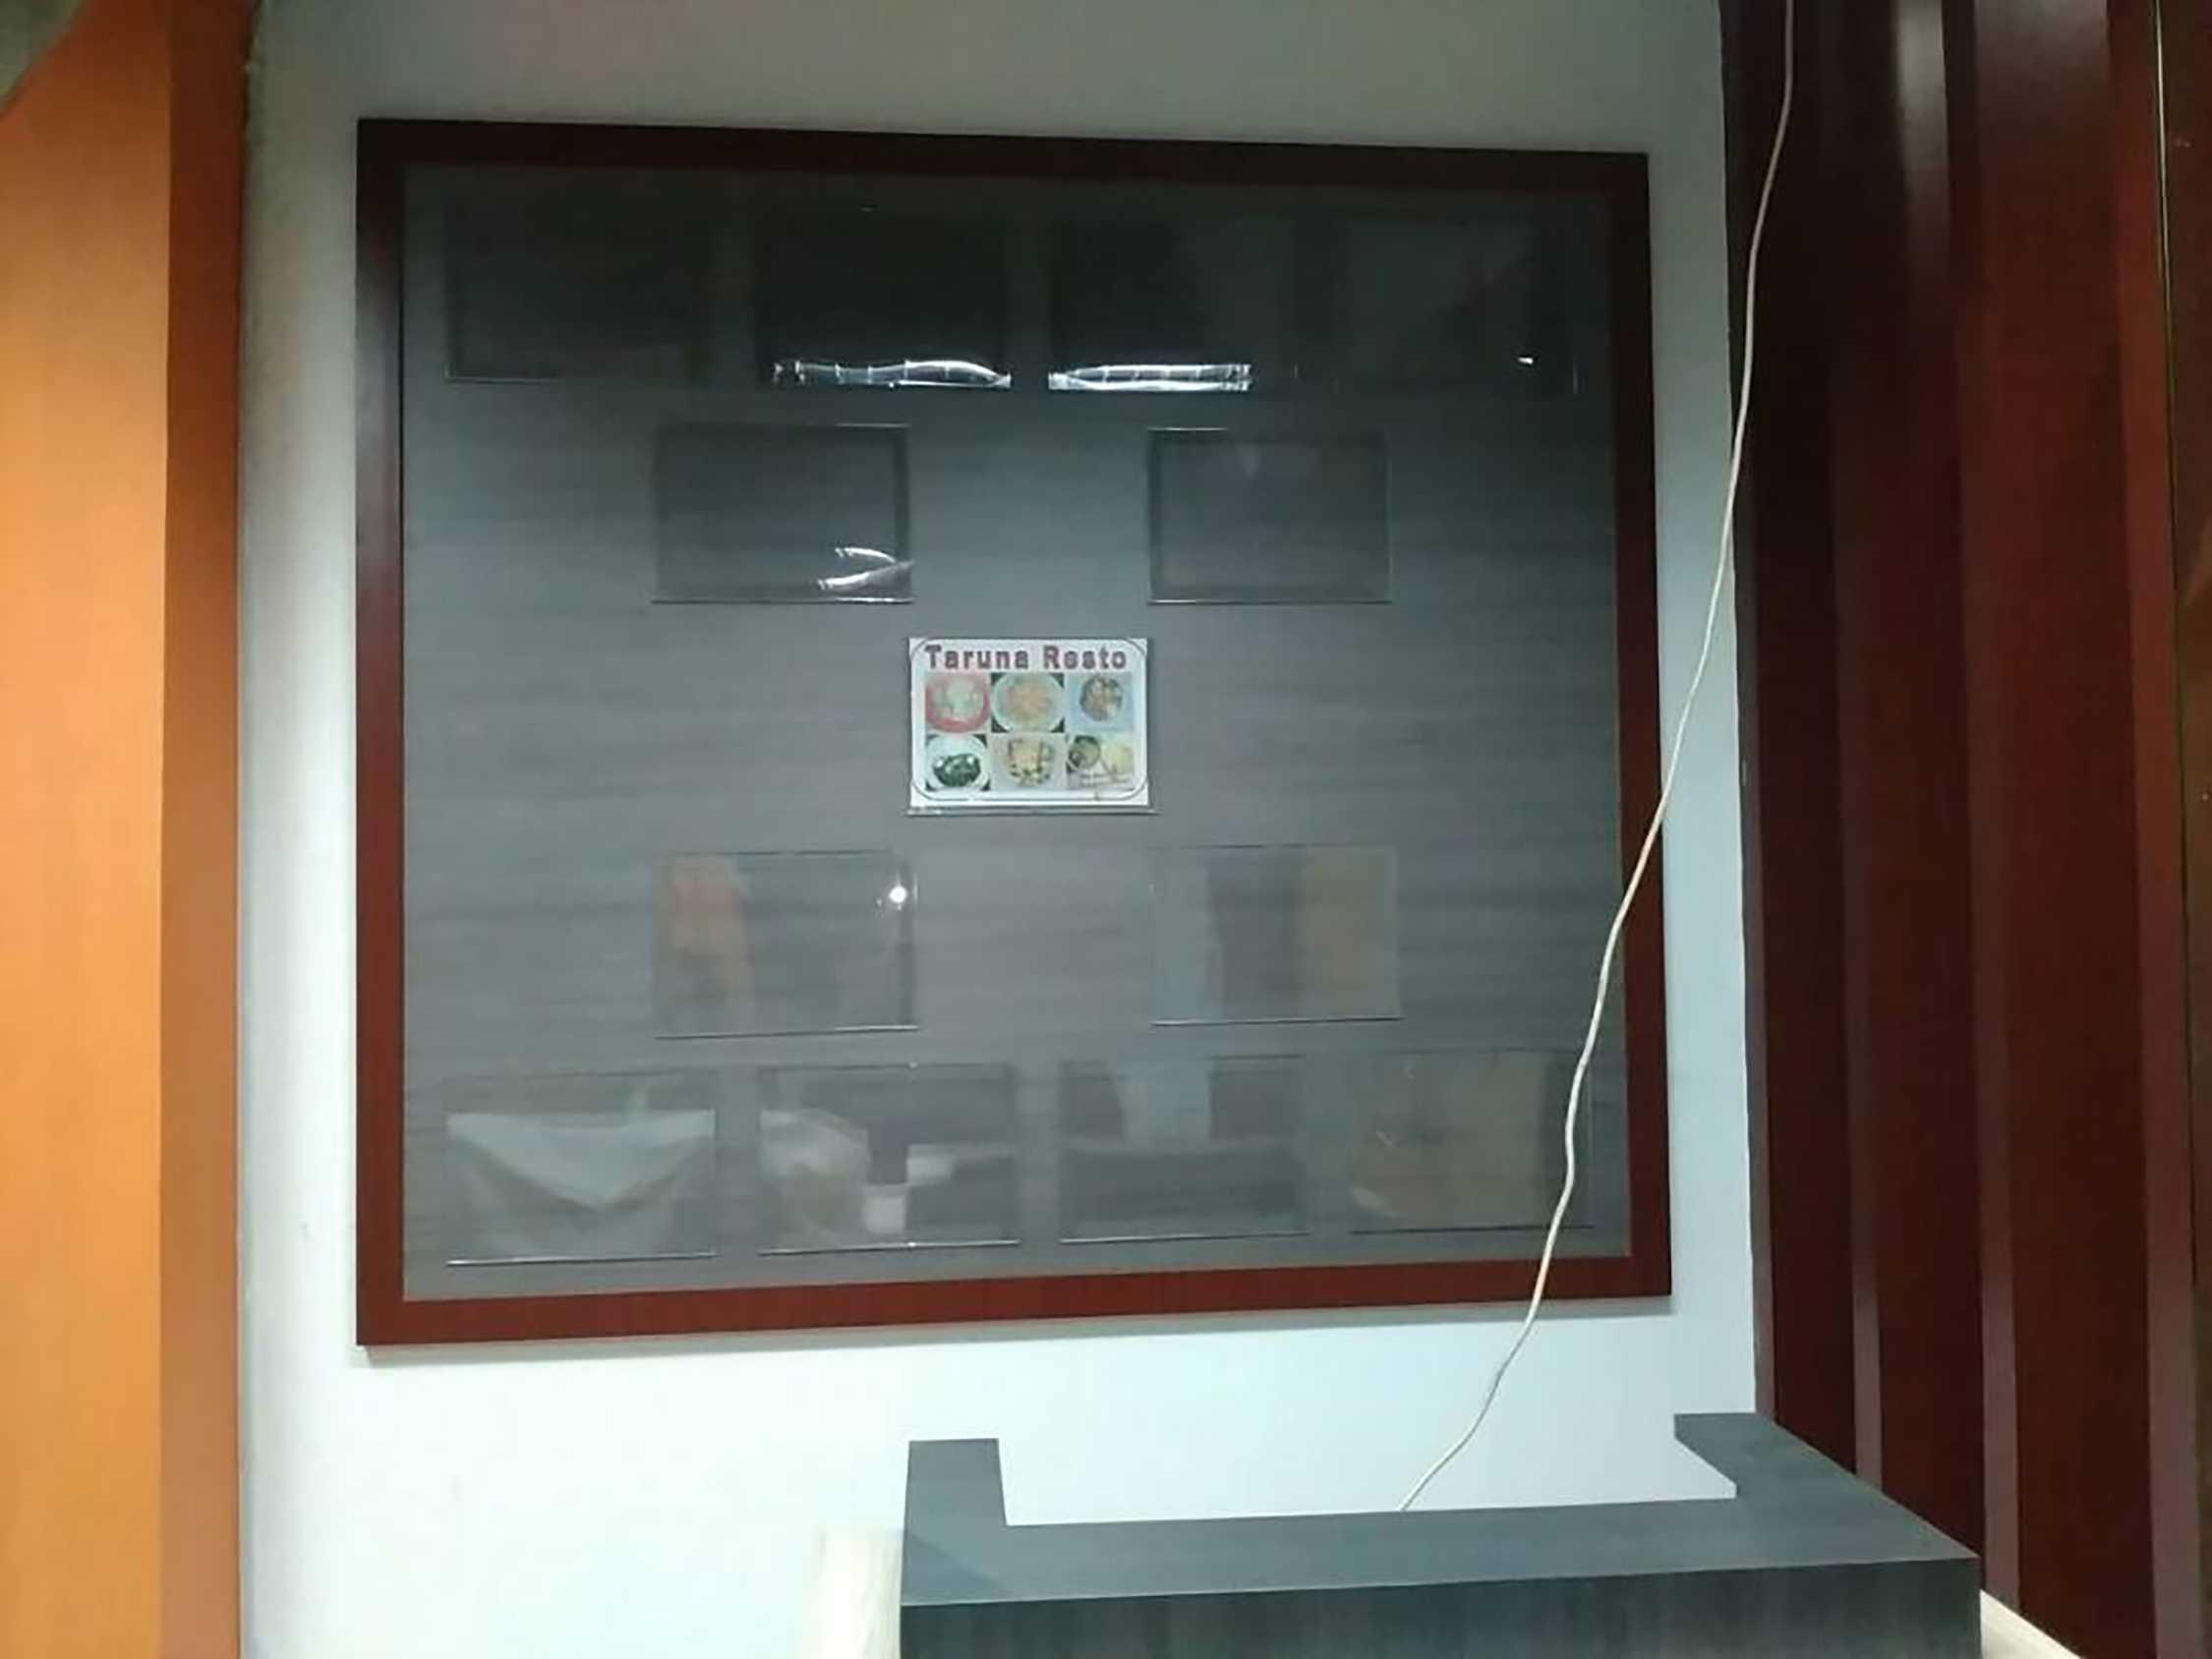 Tania Living Food Court Universitas Taruma Negara Jakarta, Daerah Khusus Ibukota Jakarta, Indonesia Jakarta, Daerah Khusus Ibukota Jakarta, Indonesia Tania-Living-Food-Court-Universitas-Taruma-Negara   120698